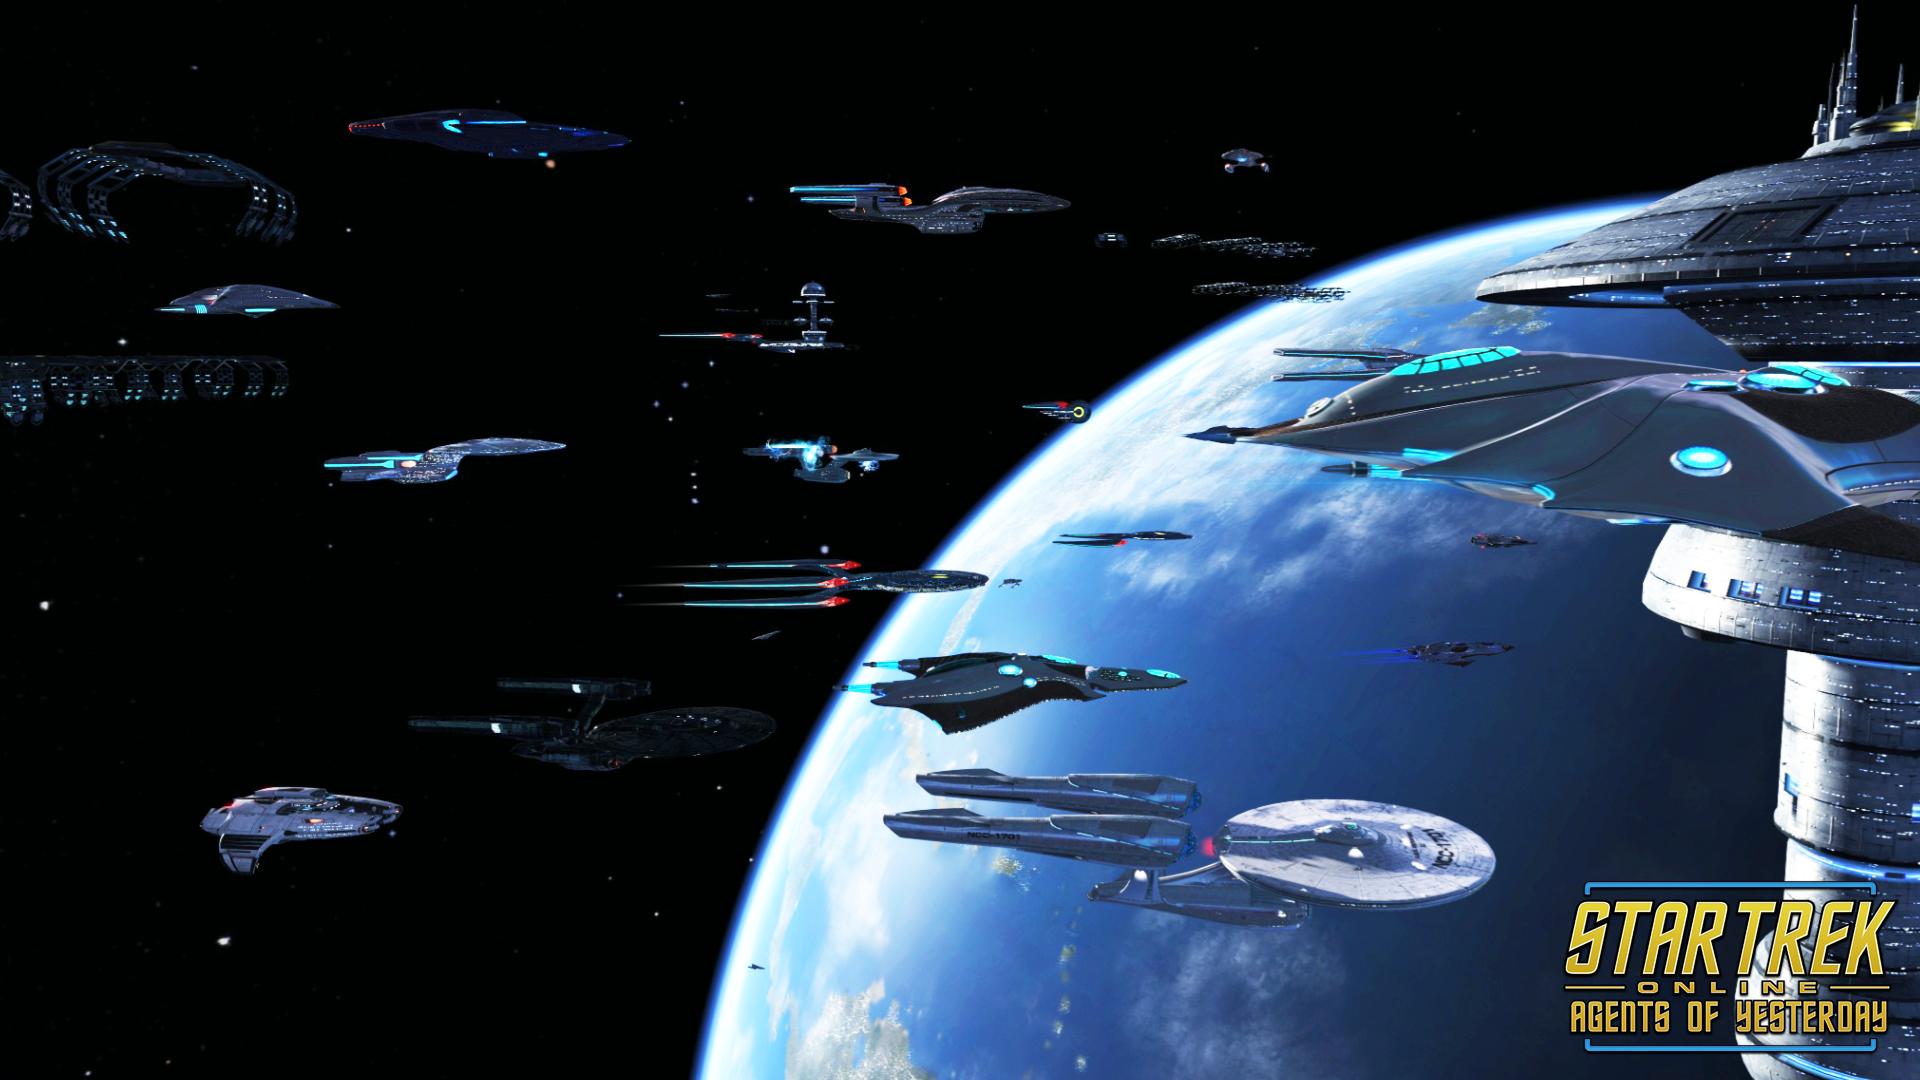 ... Star Trek Online Wallpaper 1920 x 1080